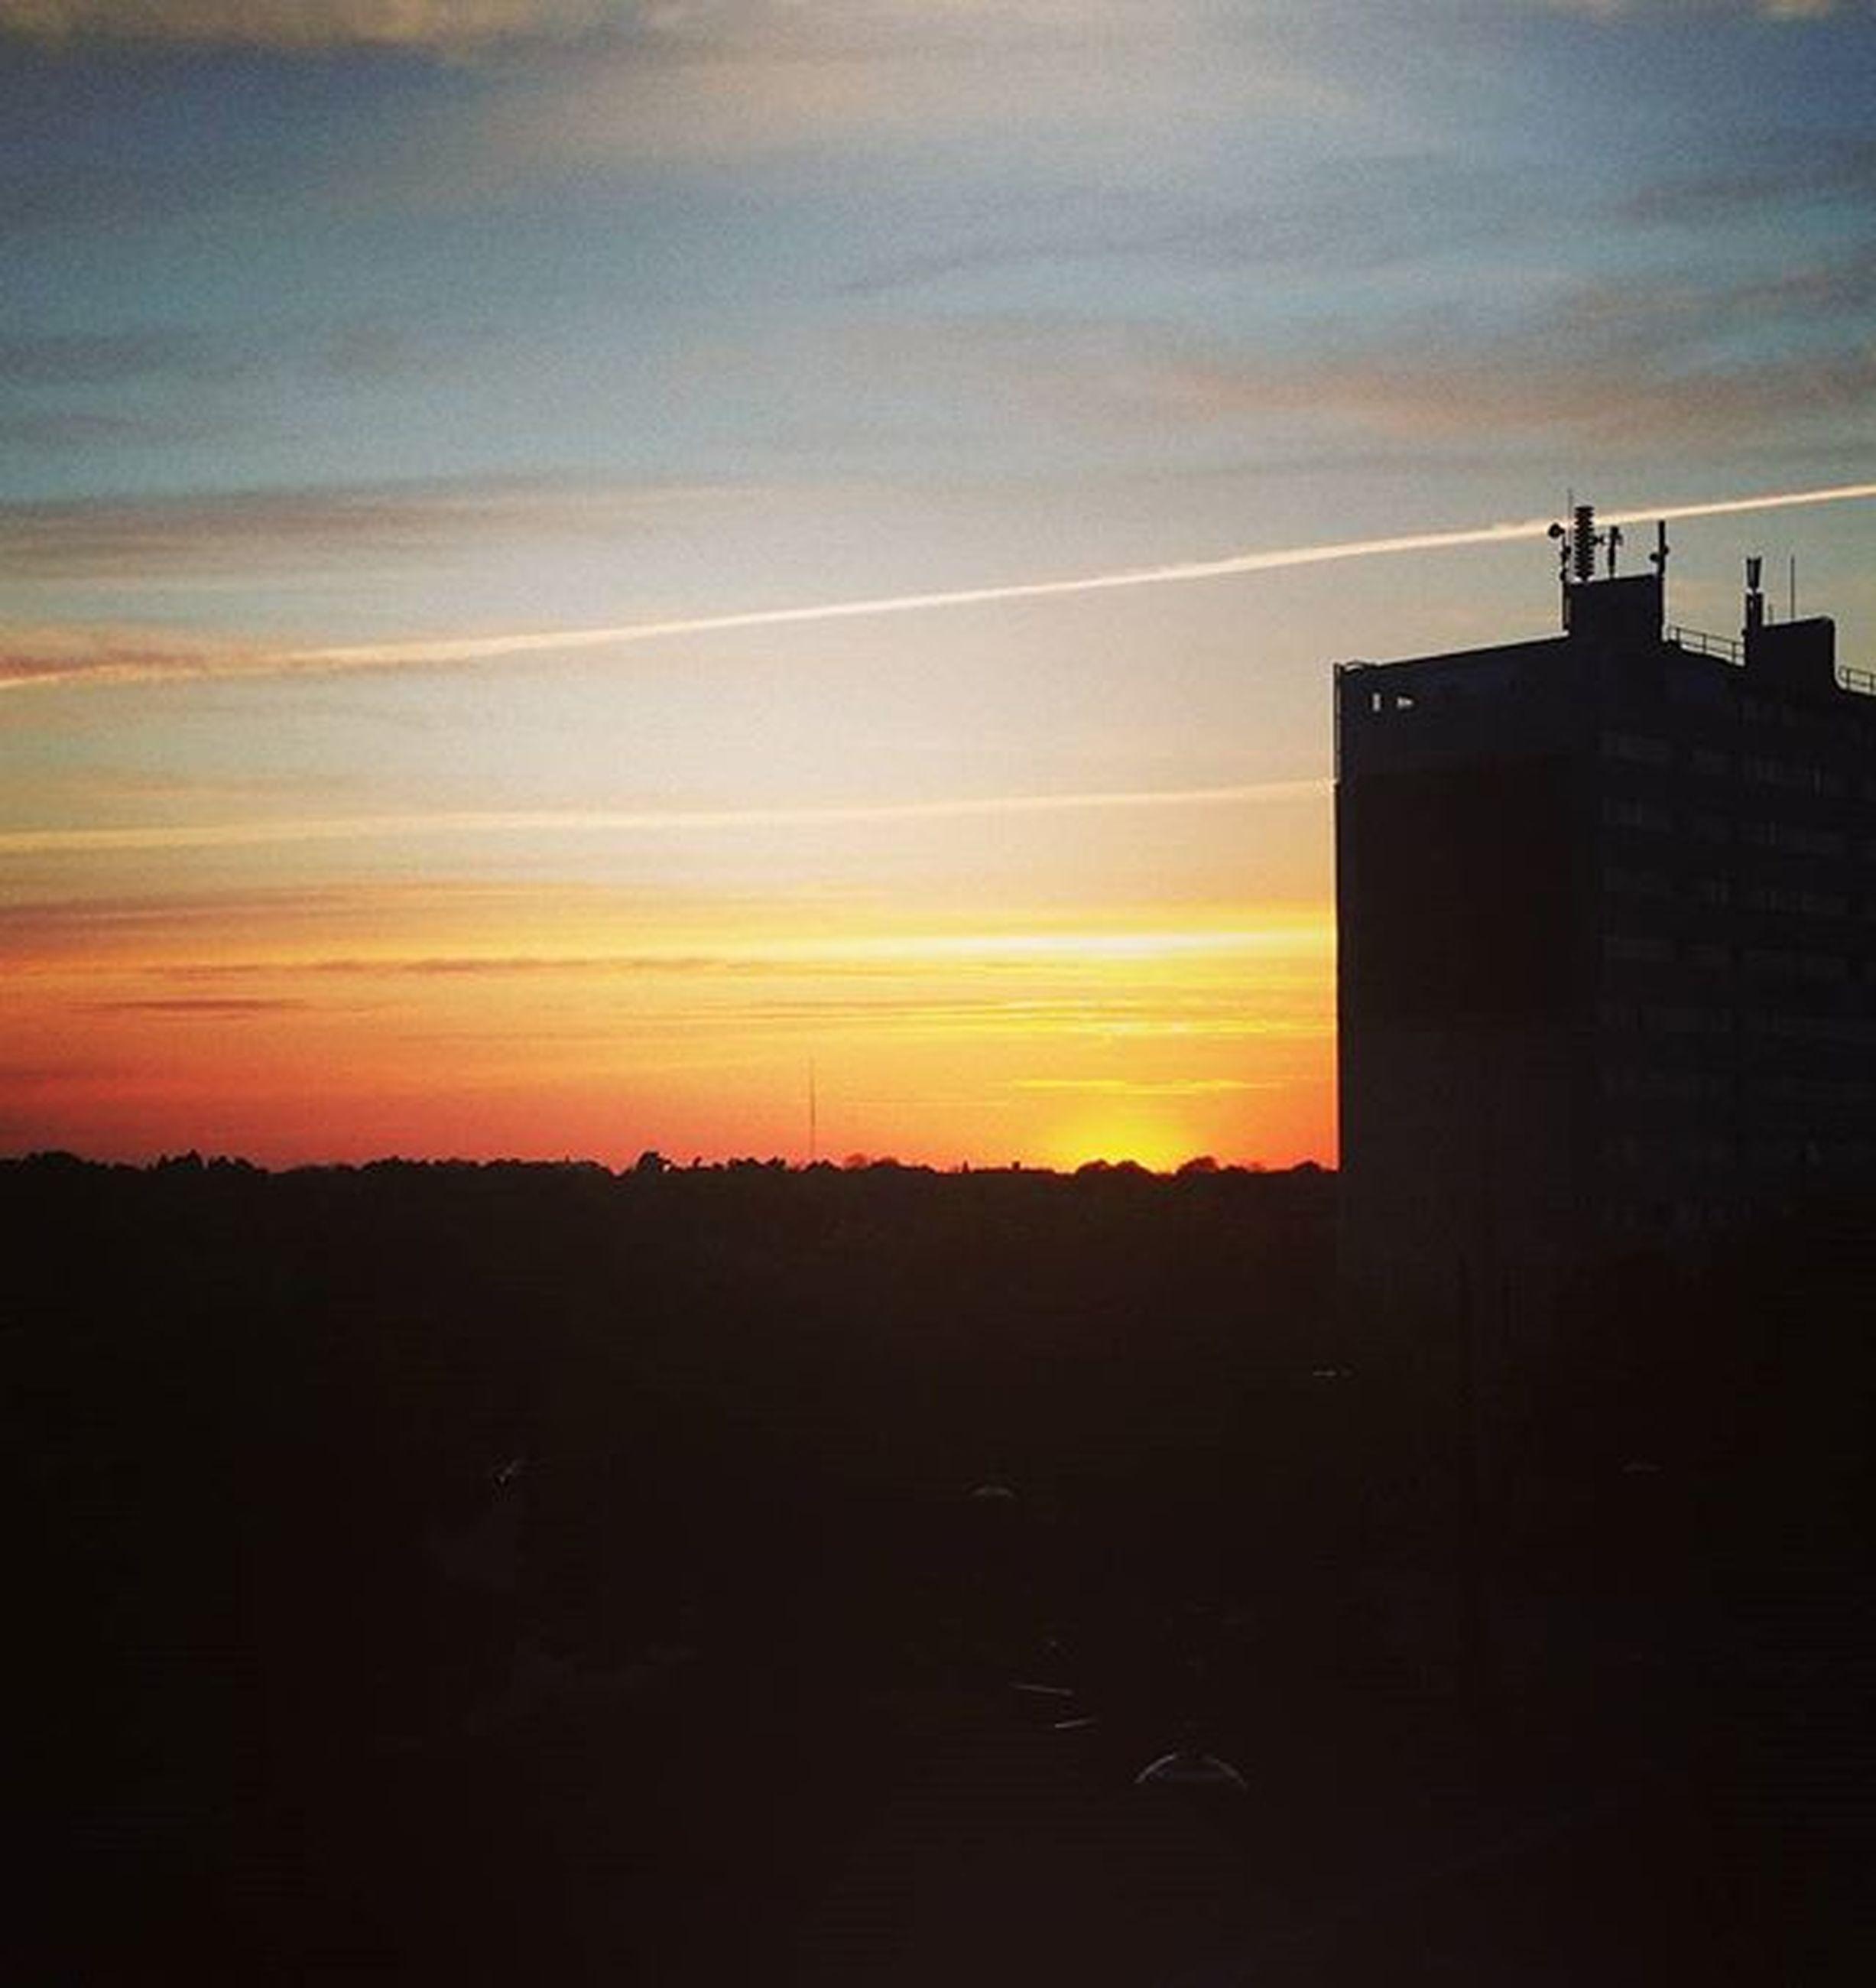 sunset, silhouette, orange color, sky, scenics, beauty in nature, built structure, tranquil scene, dark, building exterior, tranquility, architecture, nature, idyllic, landscape, cloud - sky, copy space, outline, cloud, outdoors